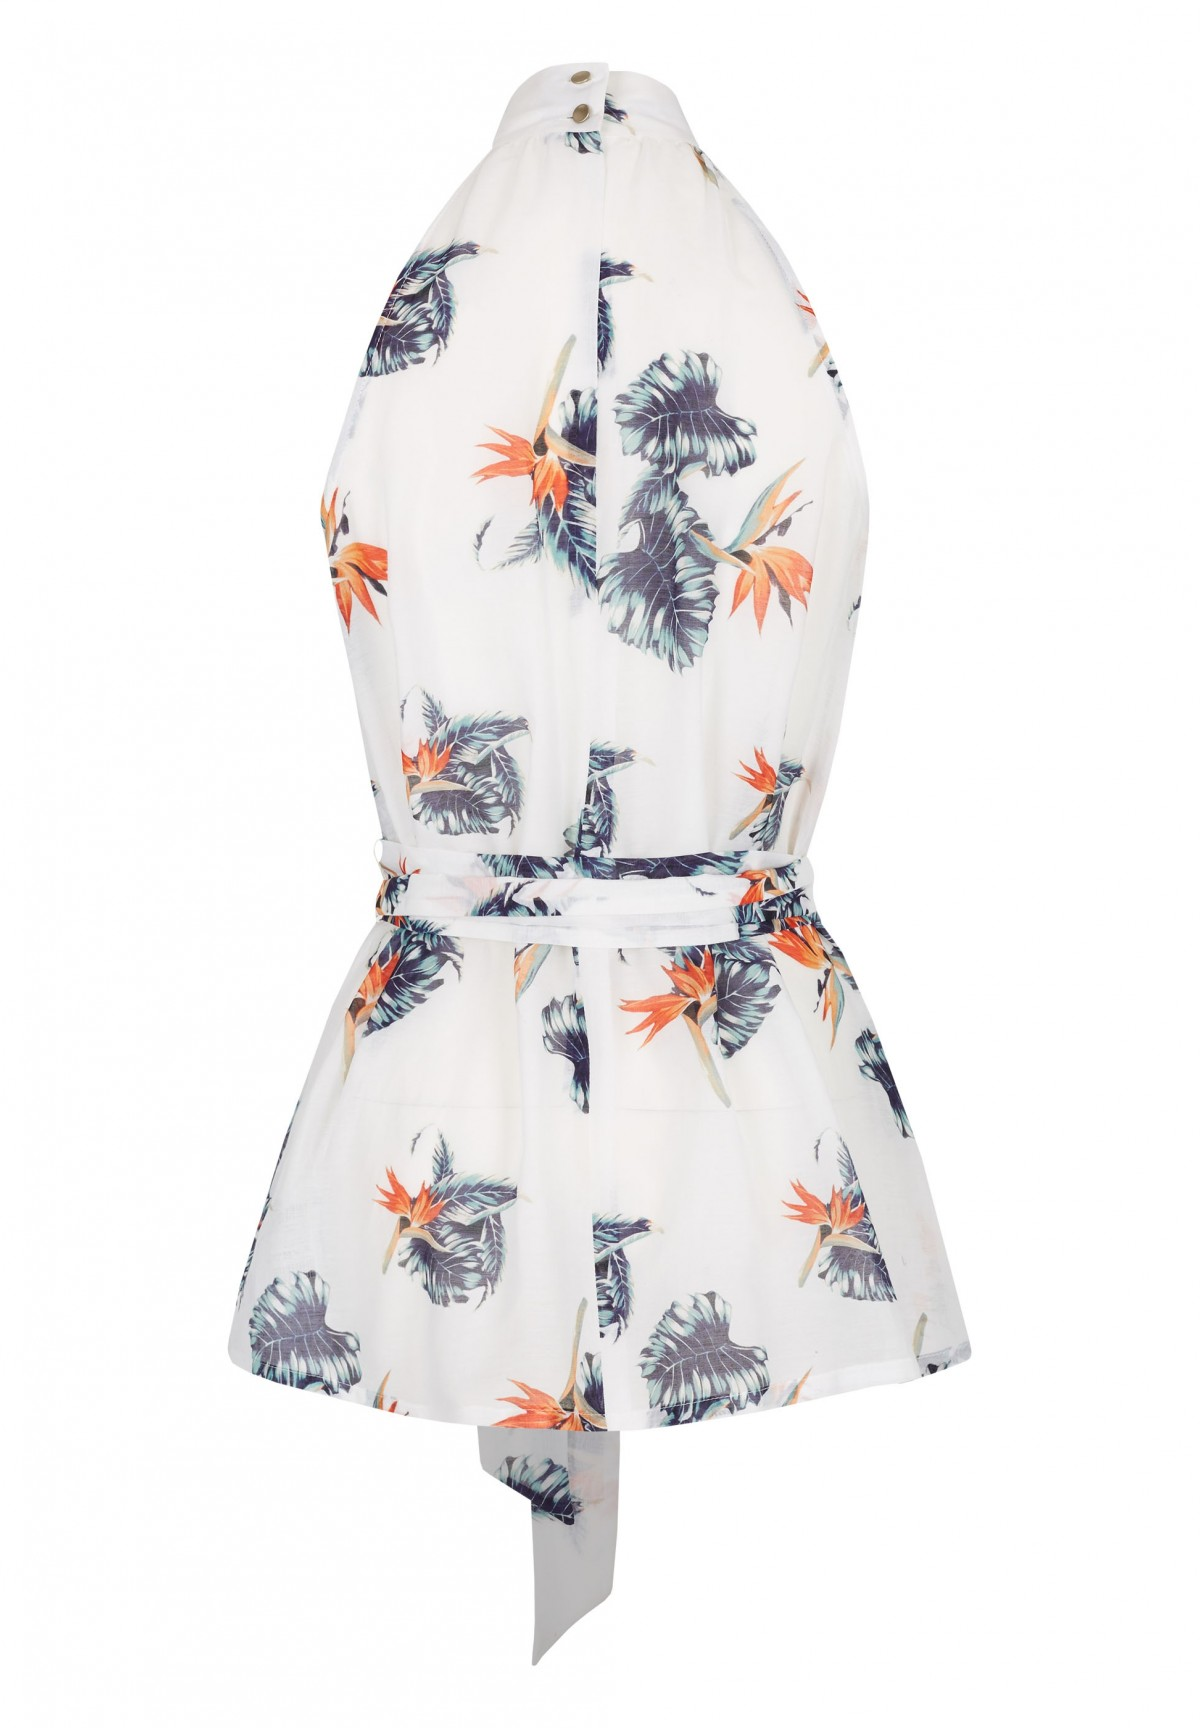 Bluse mit floralem Muster / Bluse